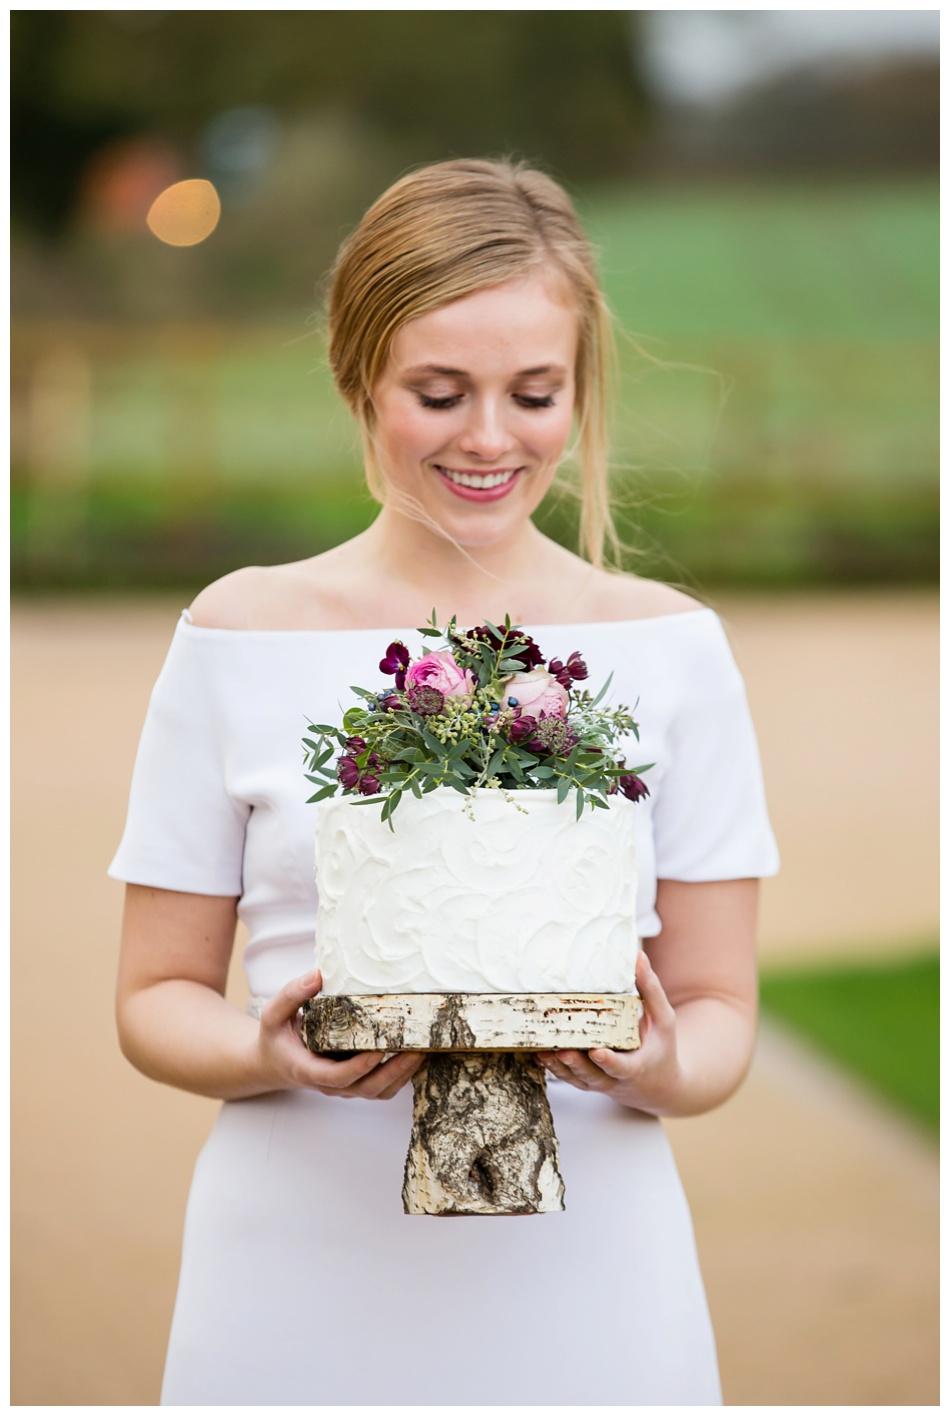 bridal editorial photography at Keddleston House Country Hotel